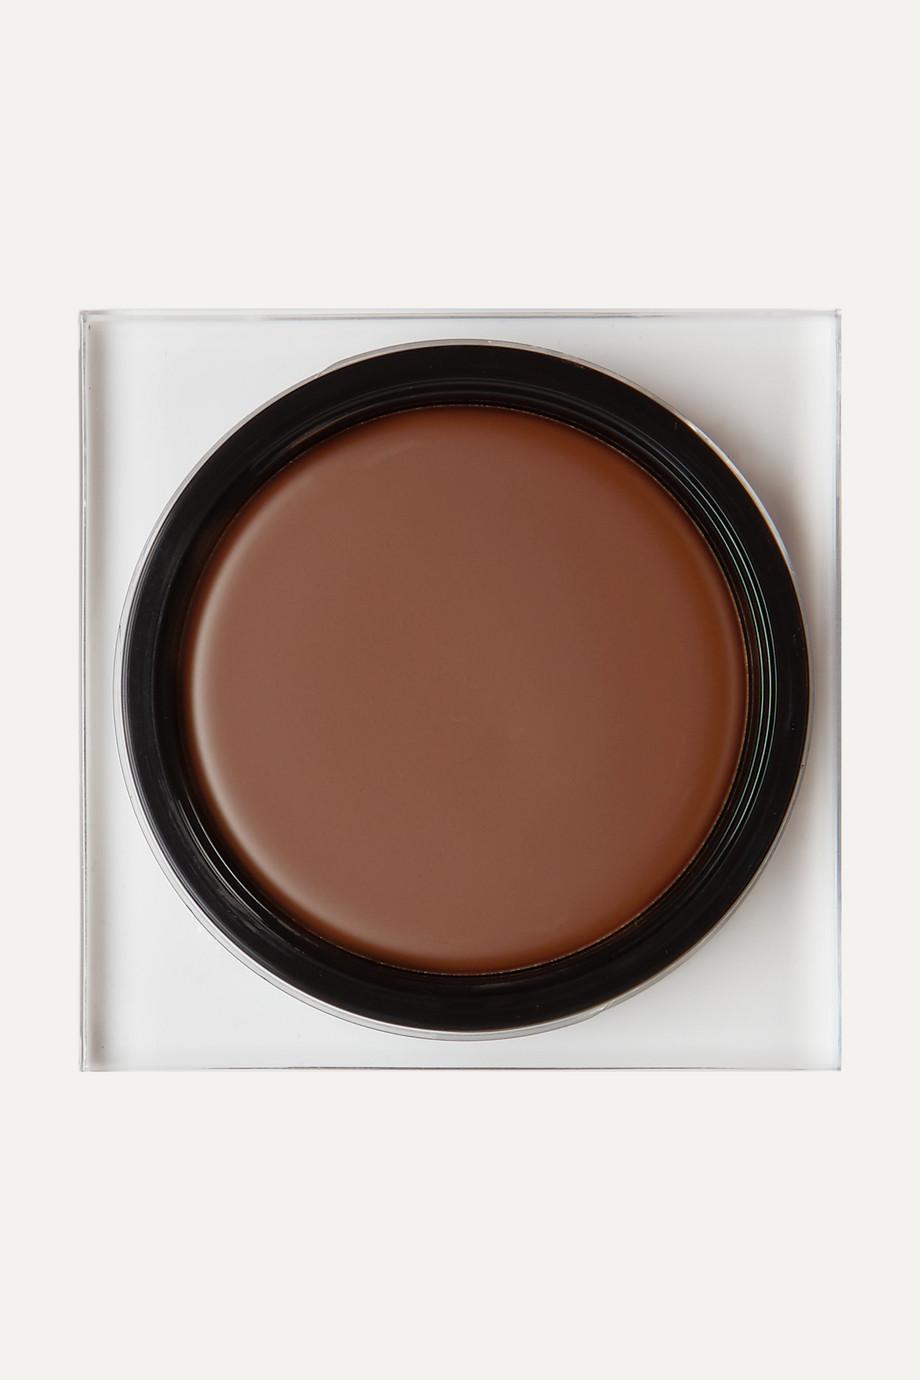 Huda Beauty Tantour Contour & Bronzer Cream - Medium